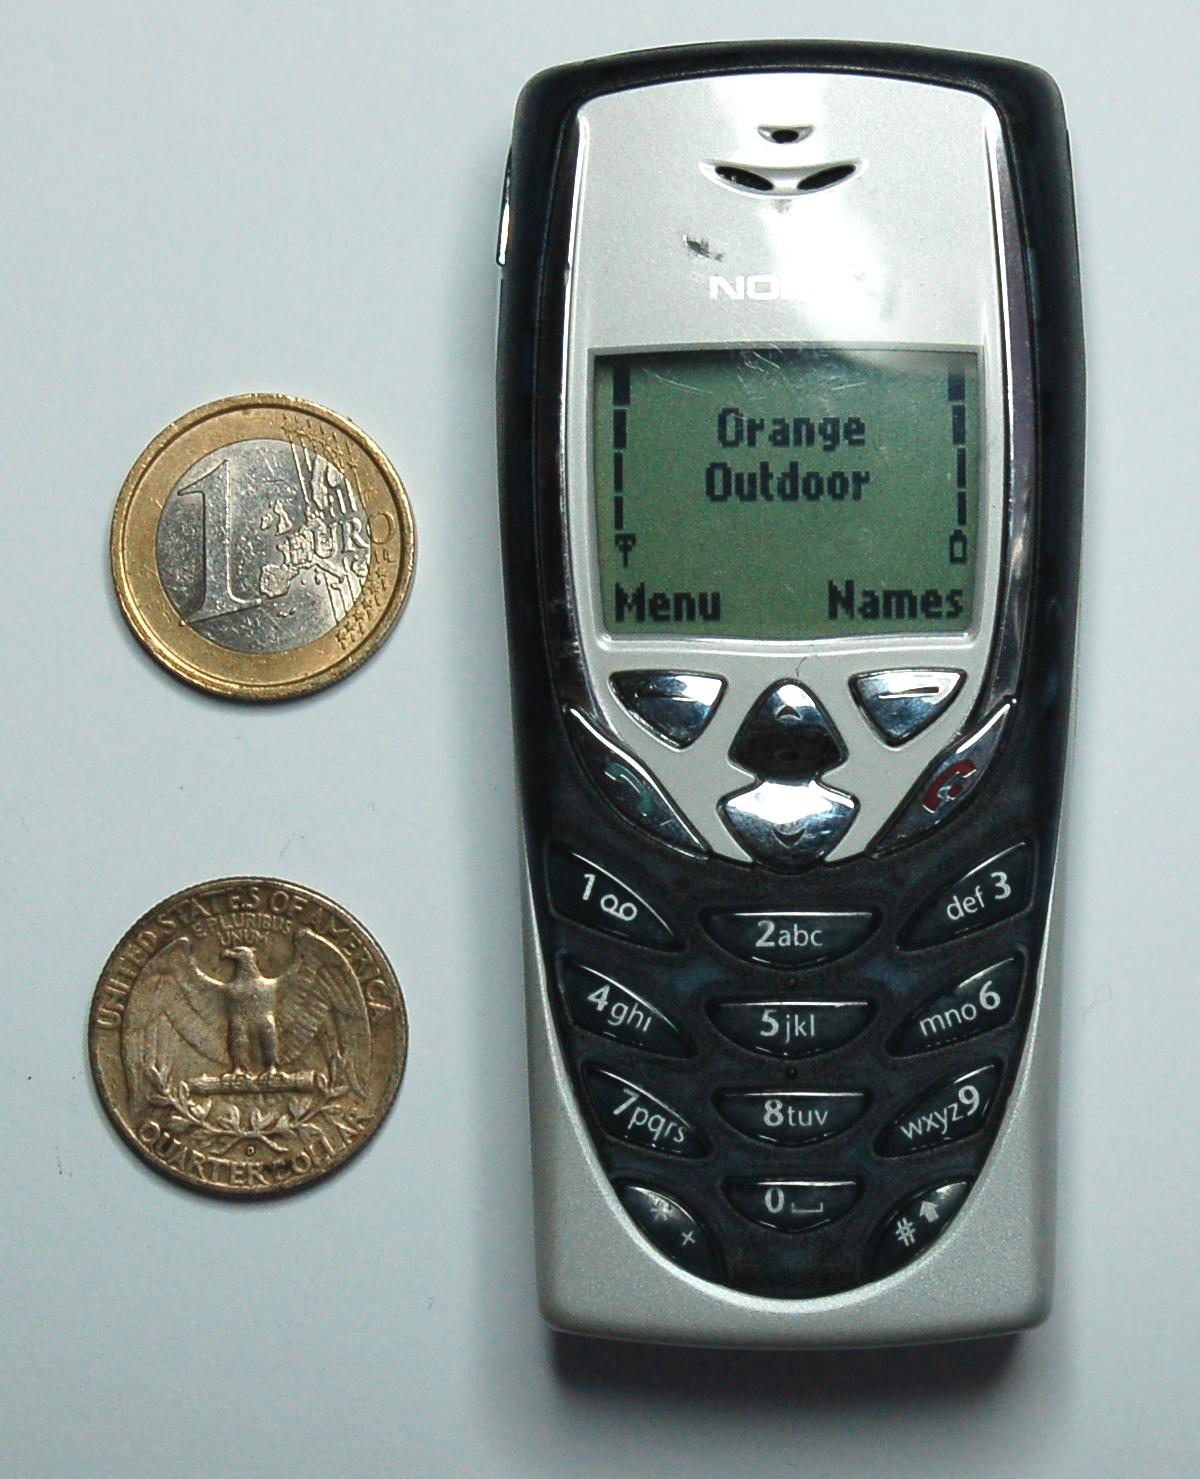 File:Nokia 8310 phone.jpg - Wikimedia Commons